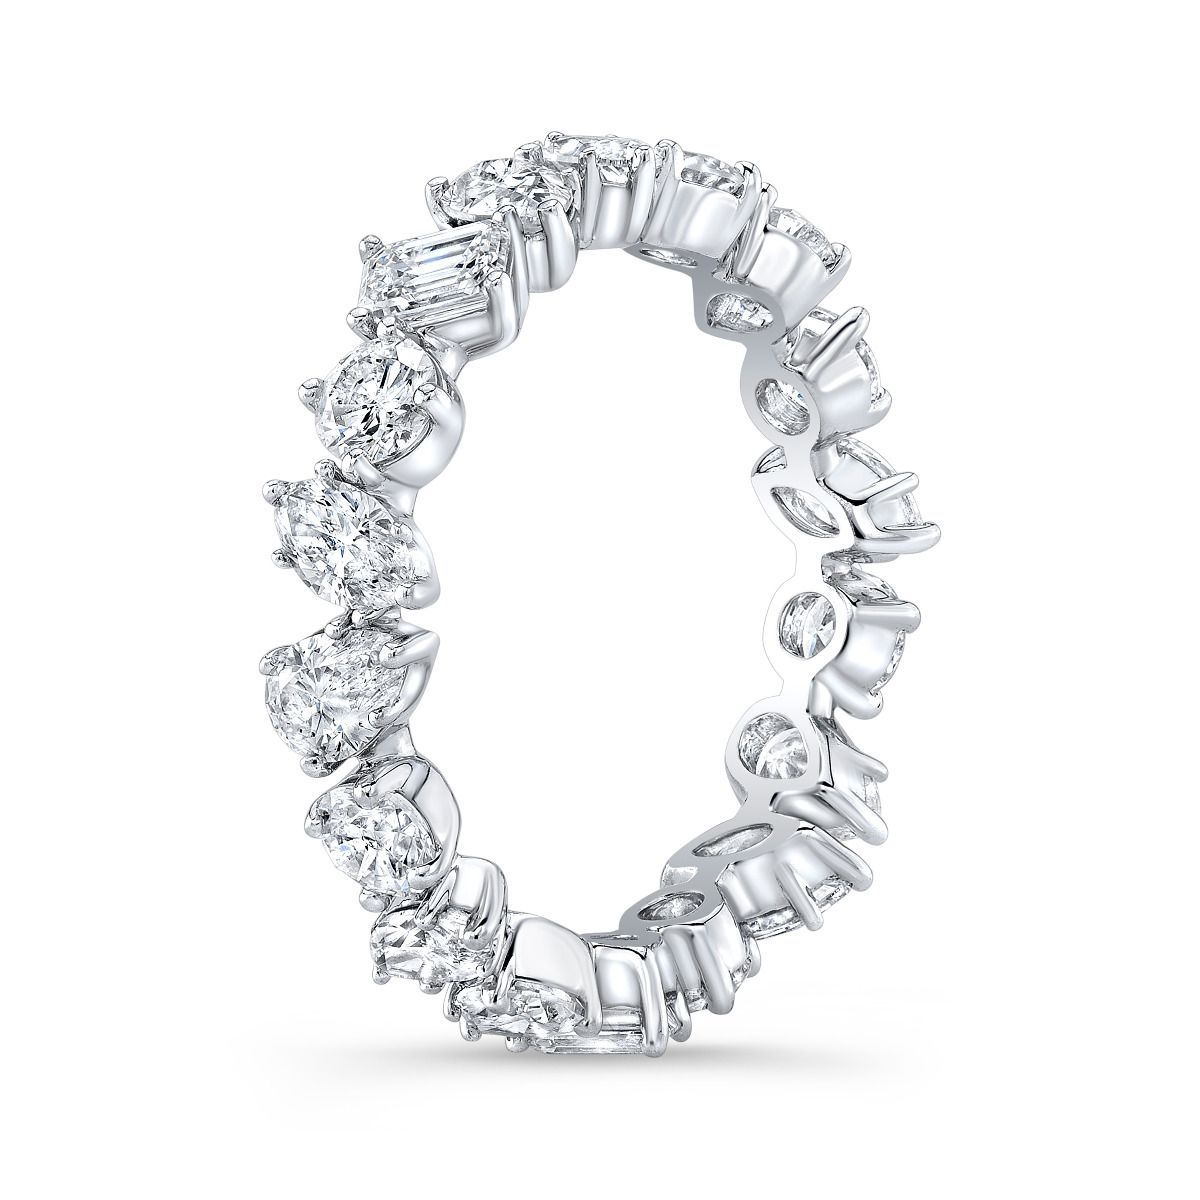 1.80 Carats Mixed Shaped Diamond Eternity Band